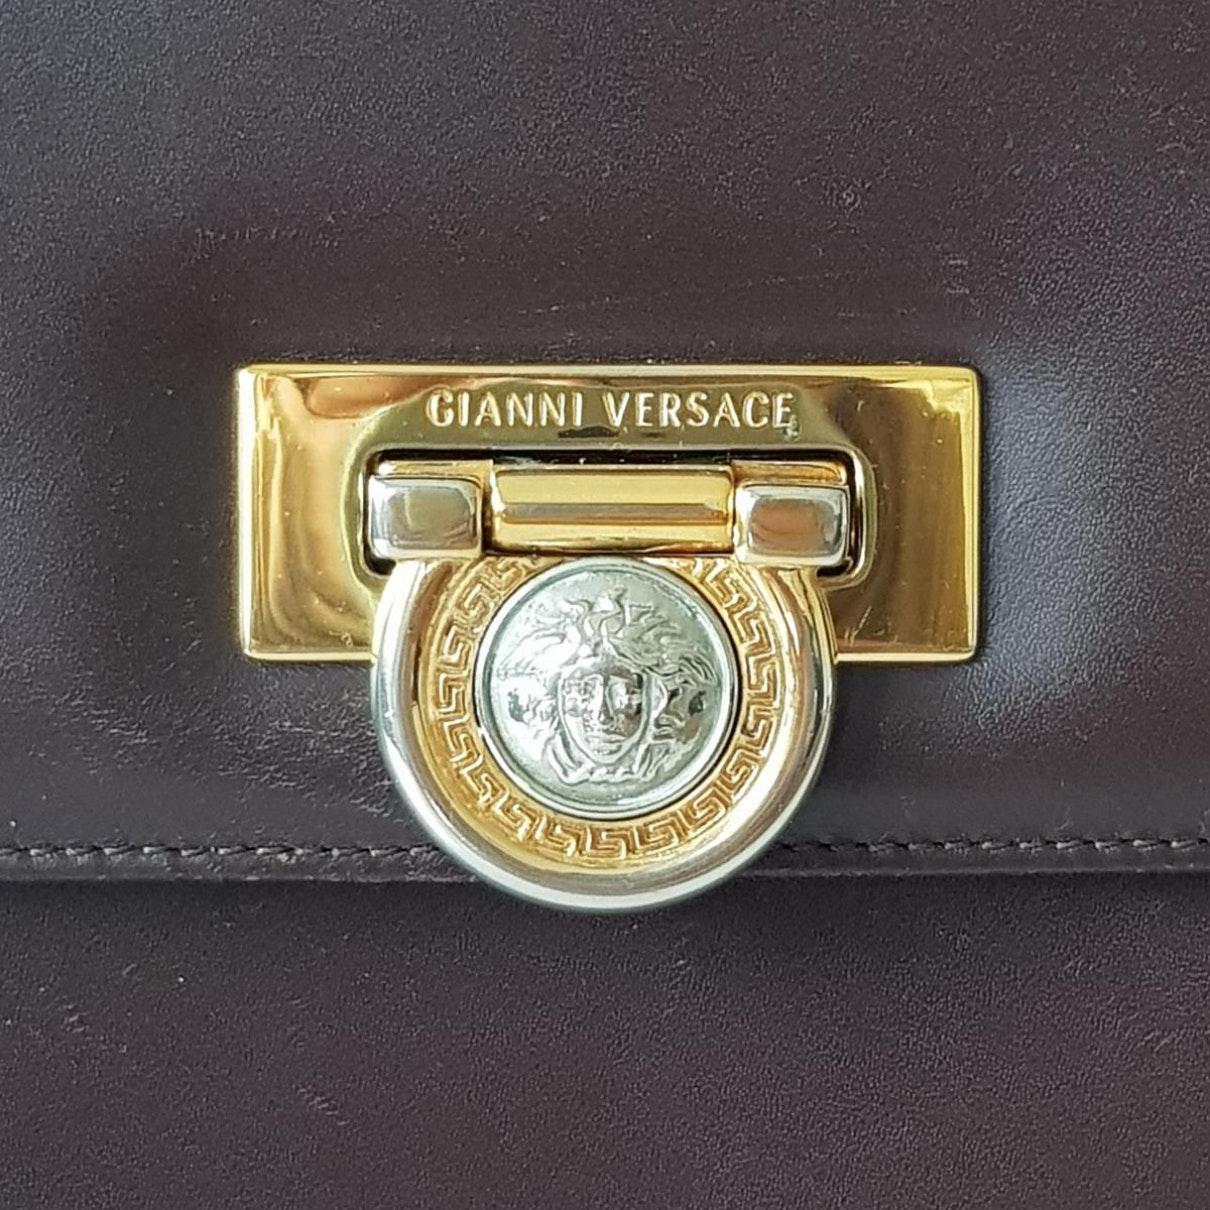 Sac à main N en Cuir Marron Versace en coloris Marron 4iFi